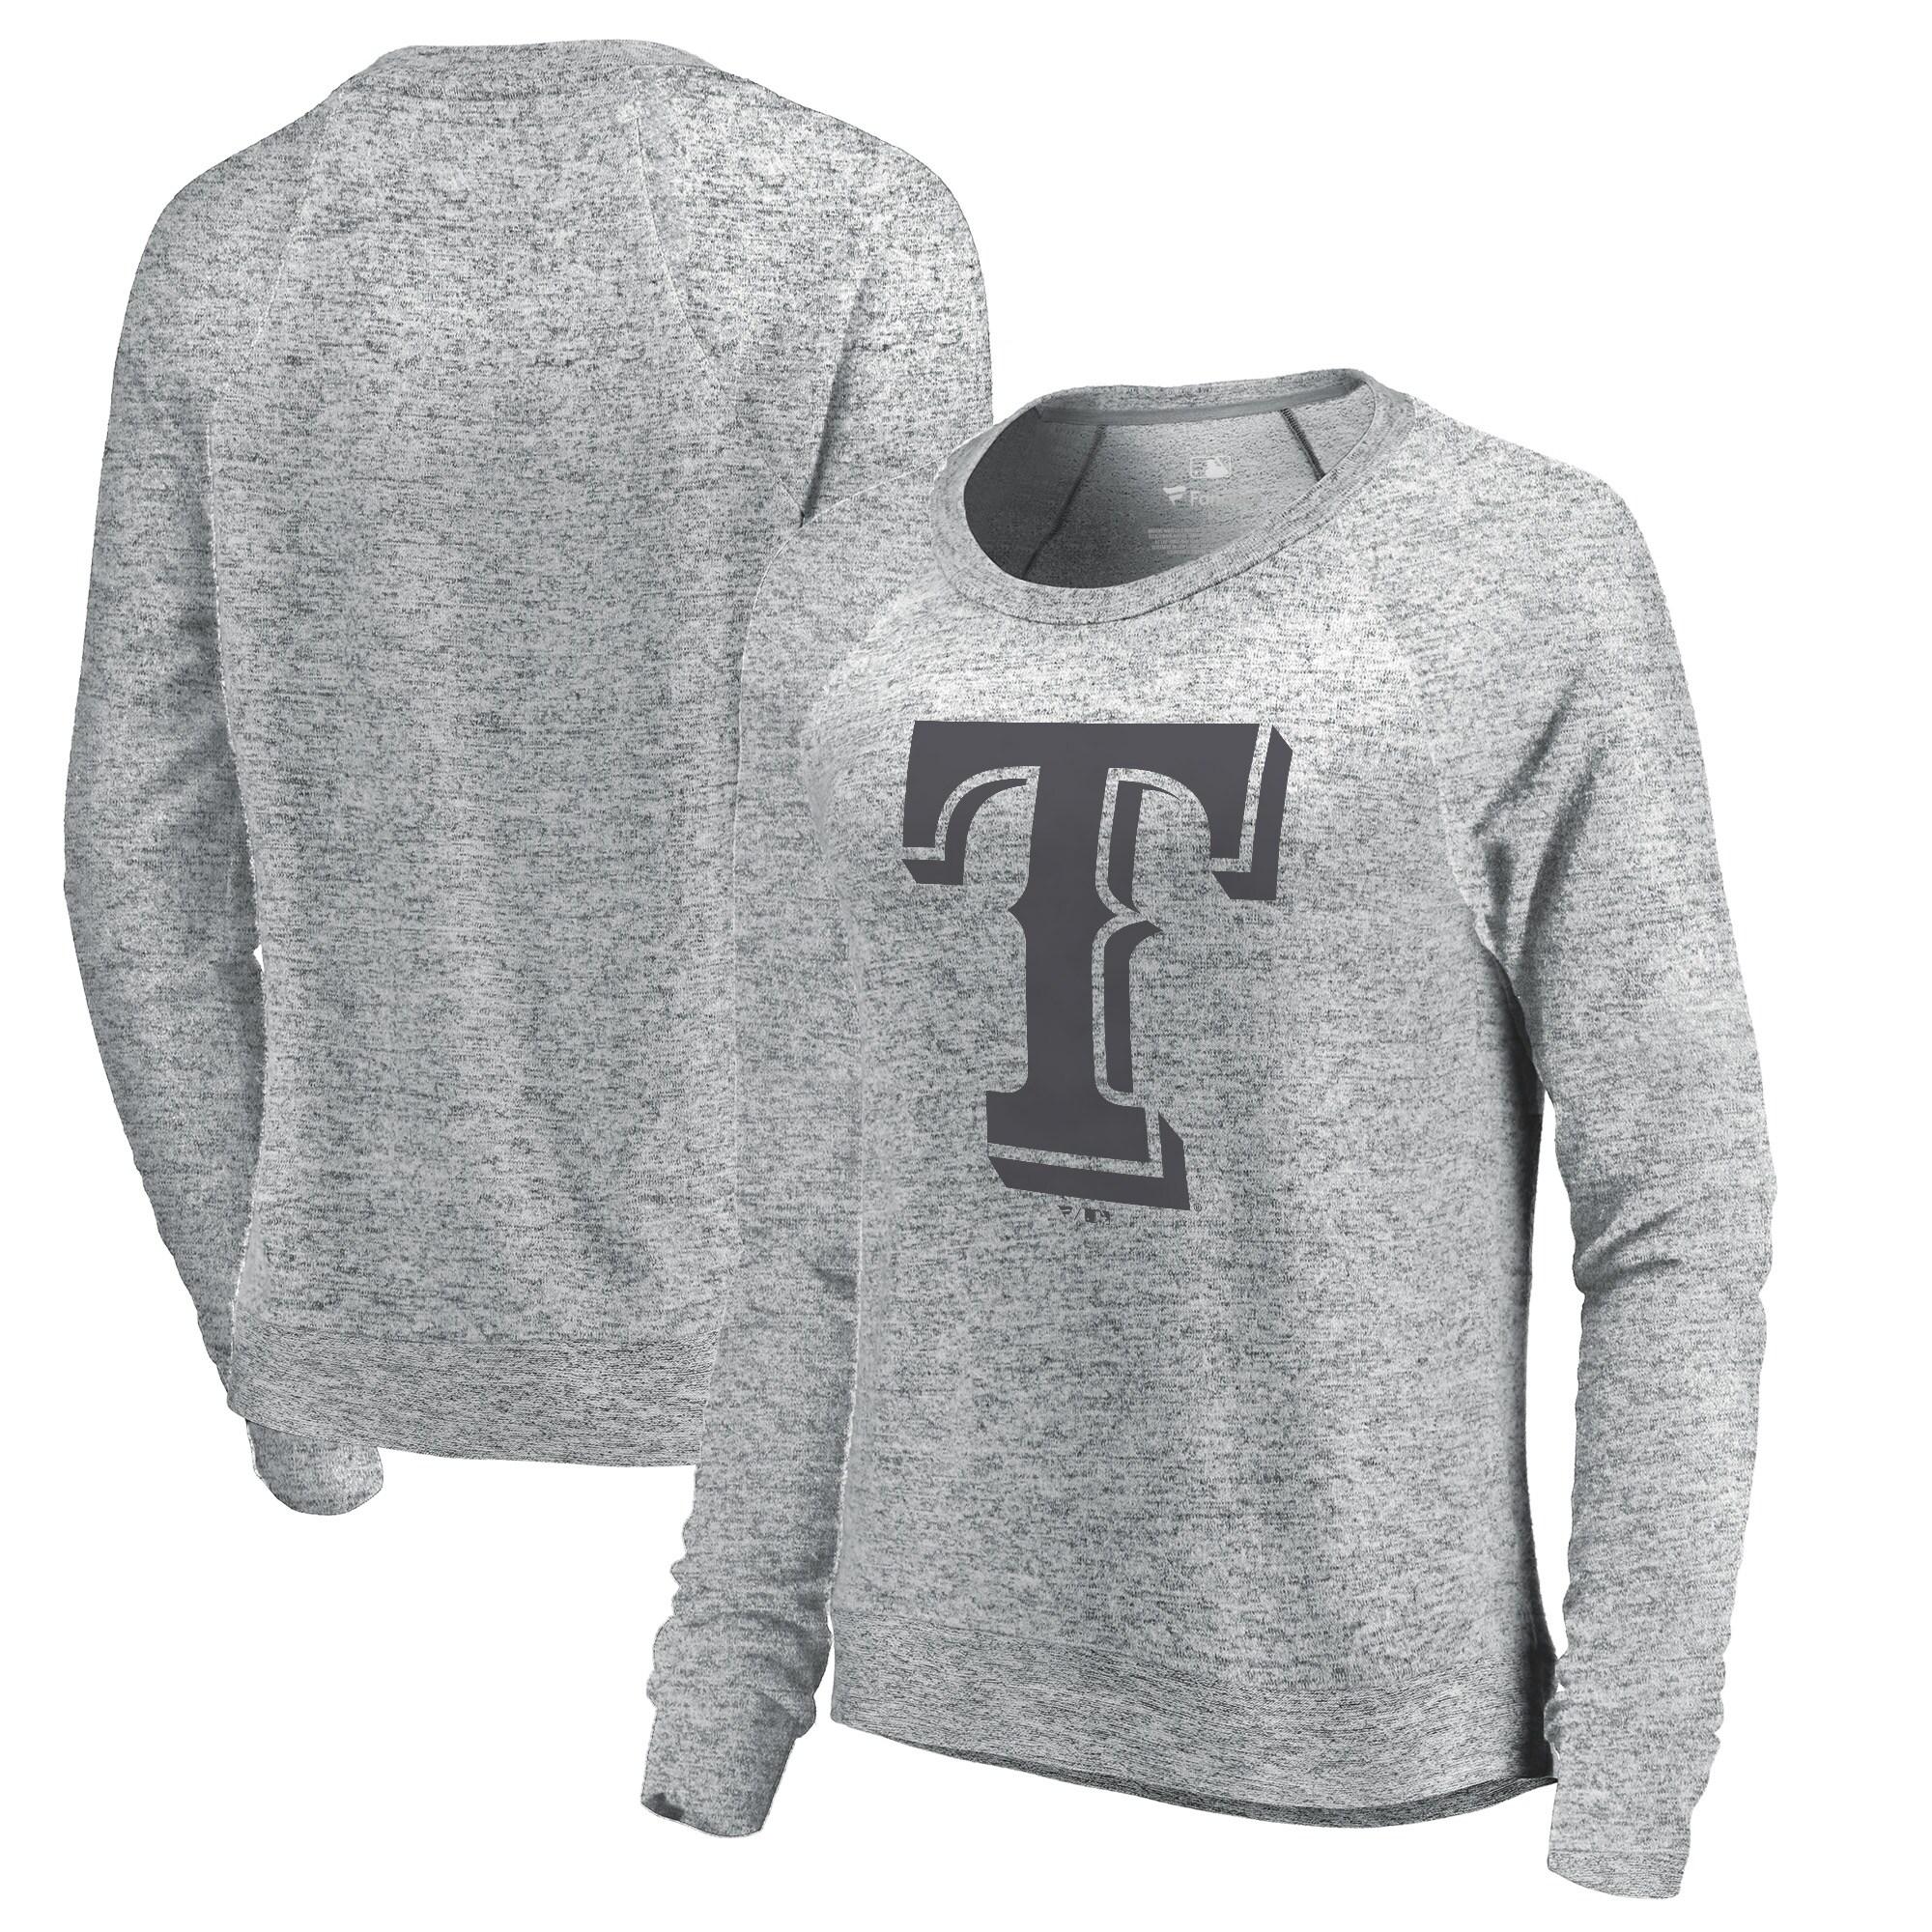 Texas Rangers Let Loose by RNL Women's Cozy Collection Plush Raglan Tri-Blend Sweatshirt - Ash